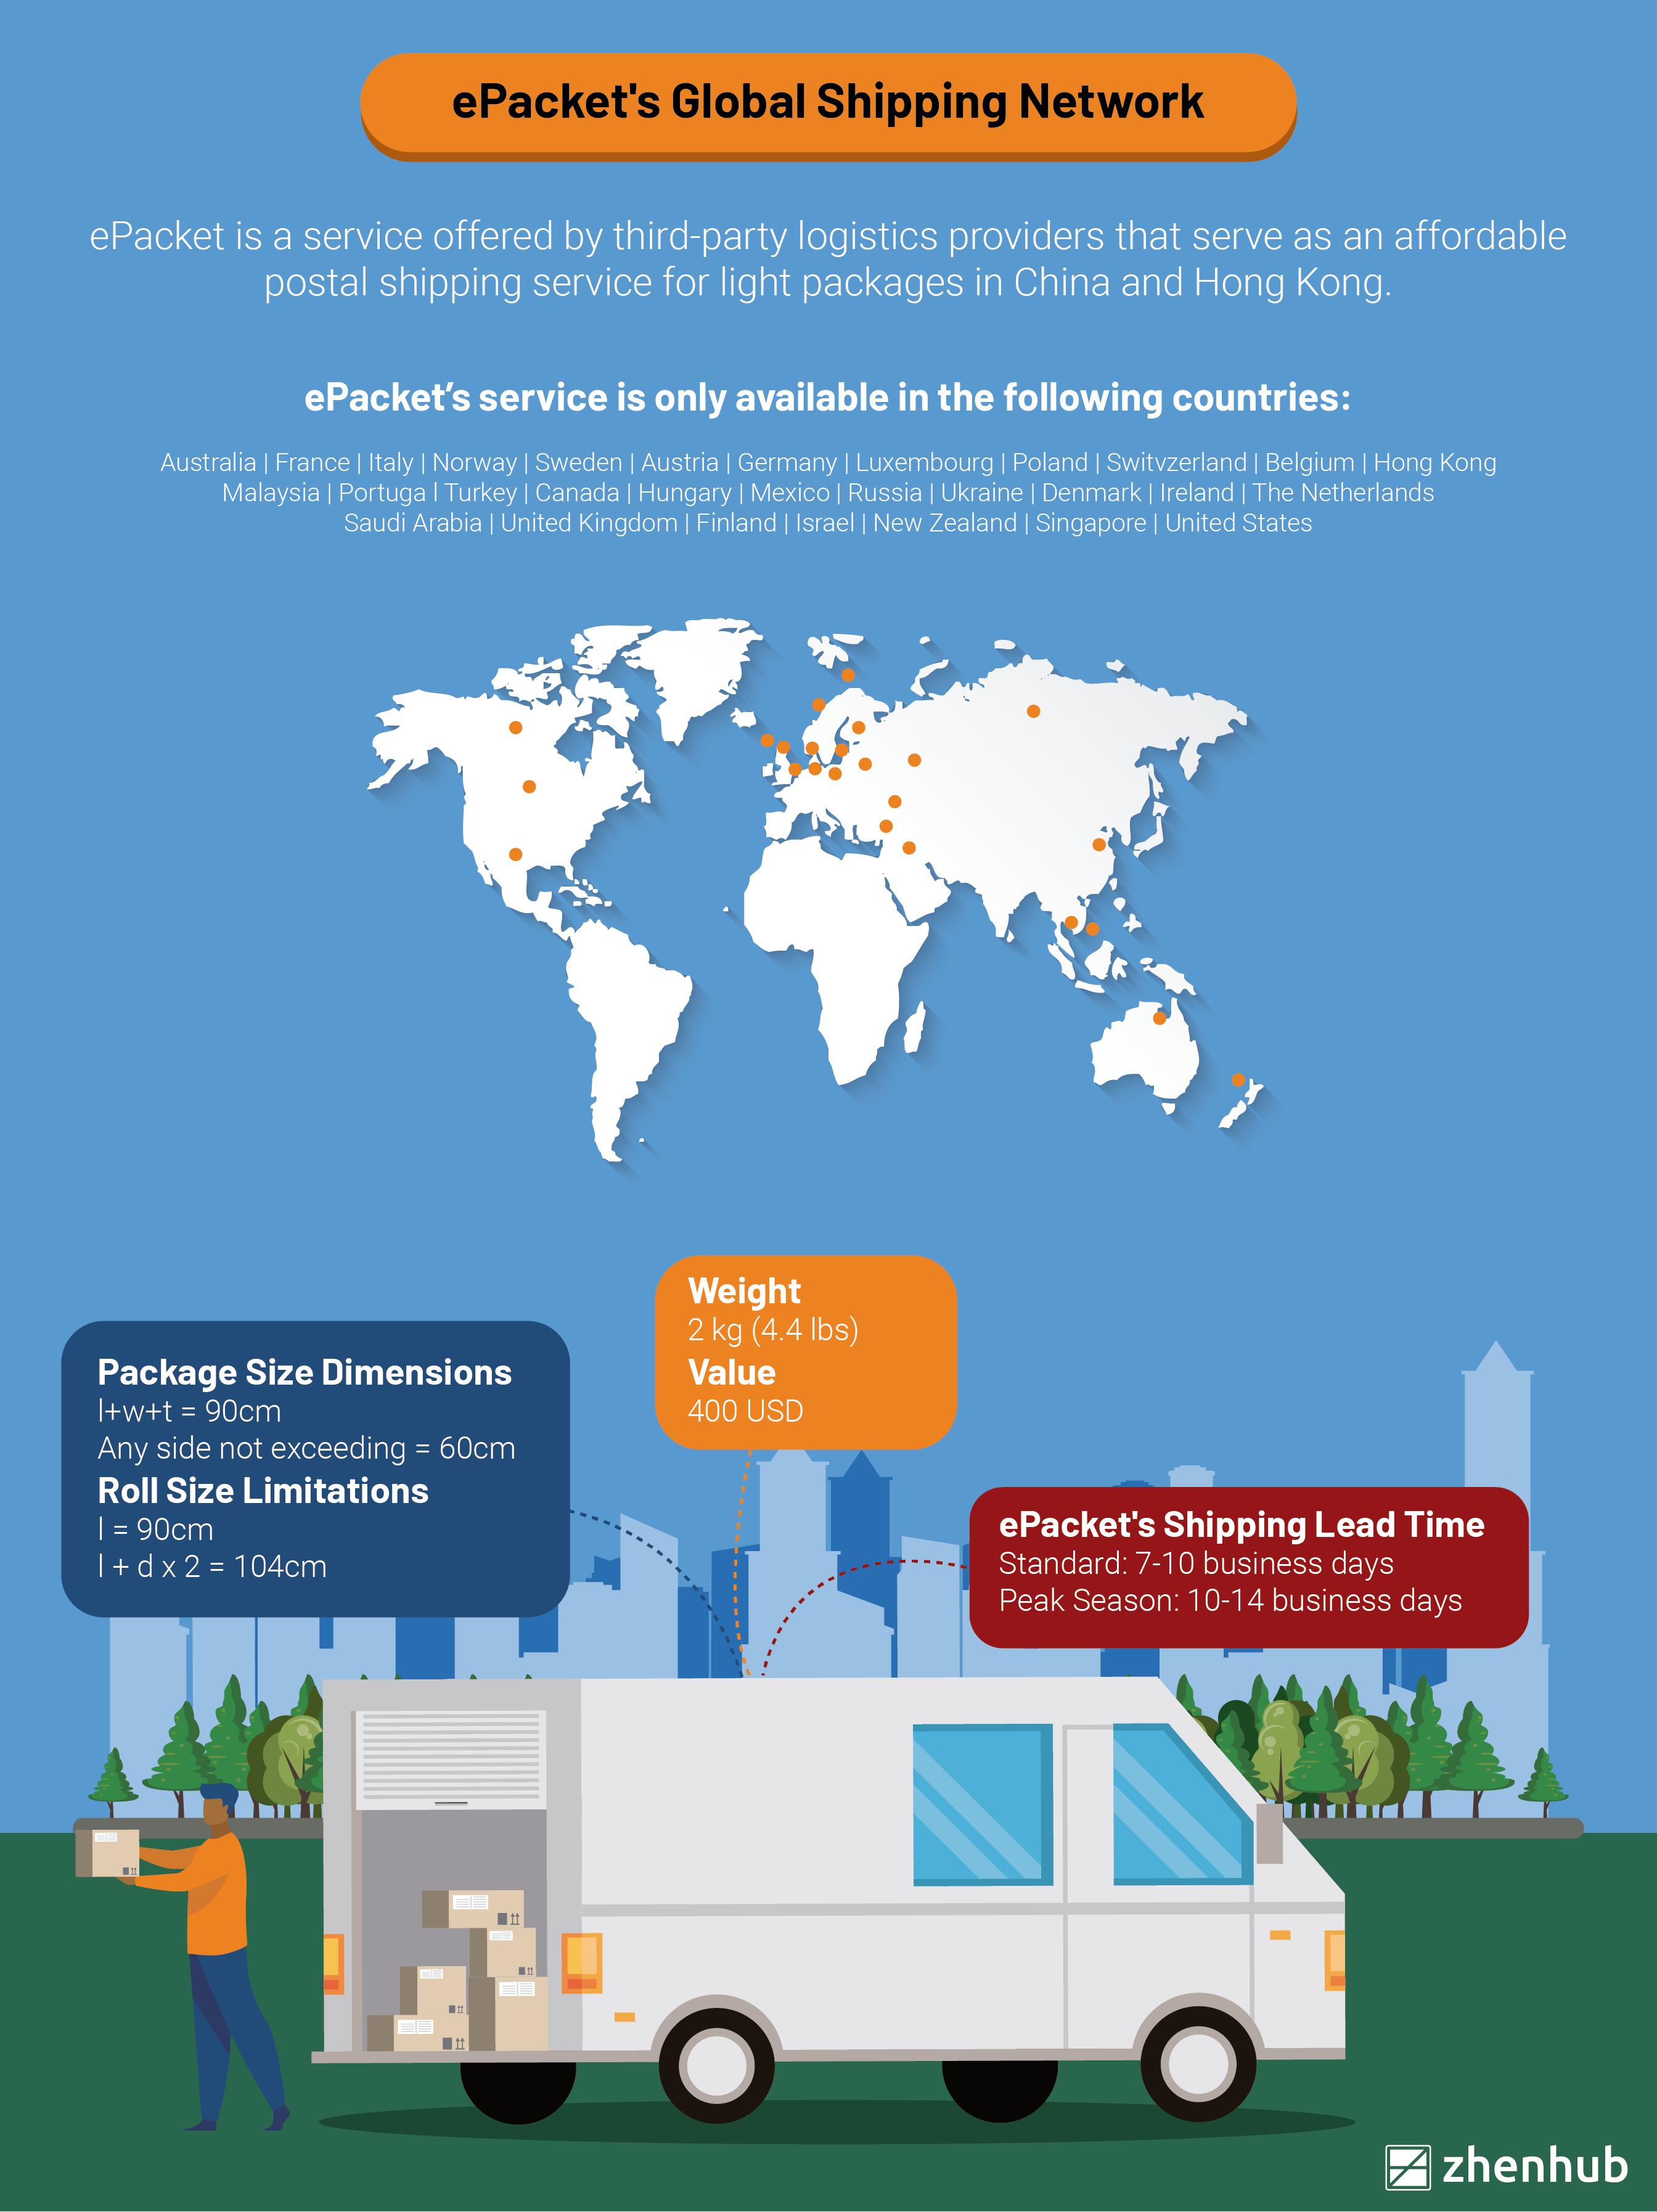 ePacket Global Shipping Network